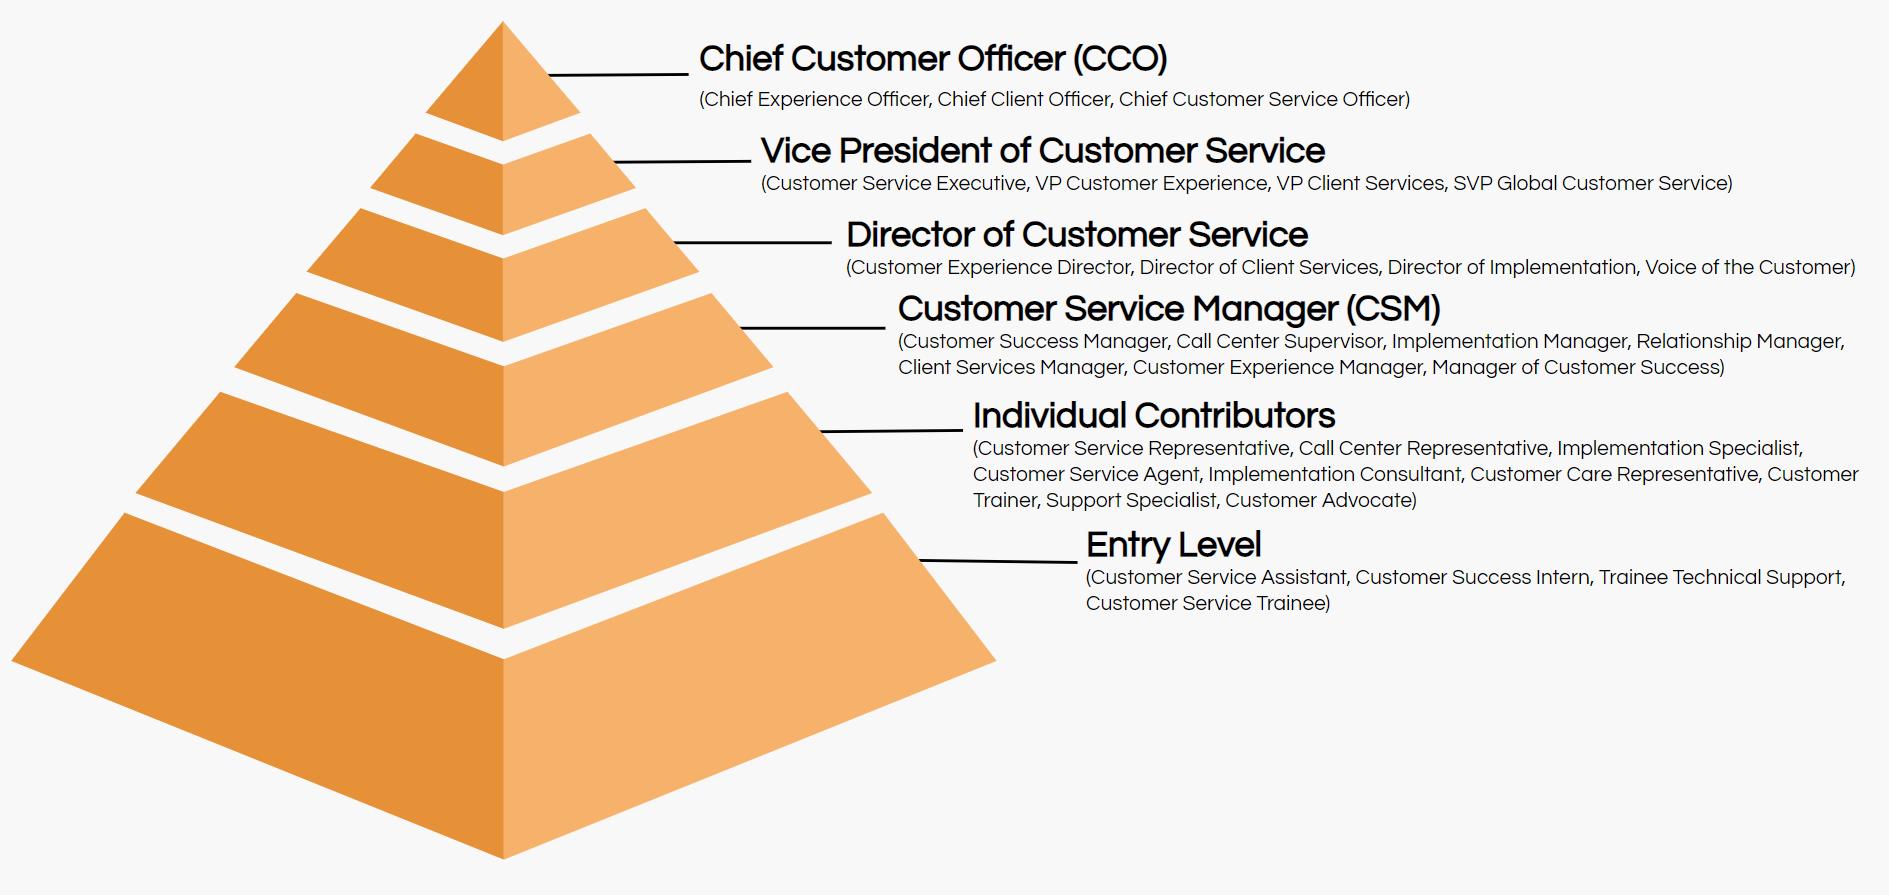 customer service job titles hierarchy